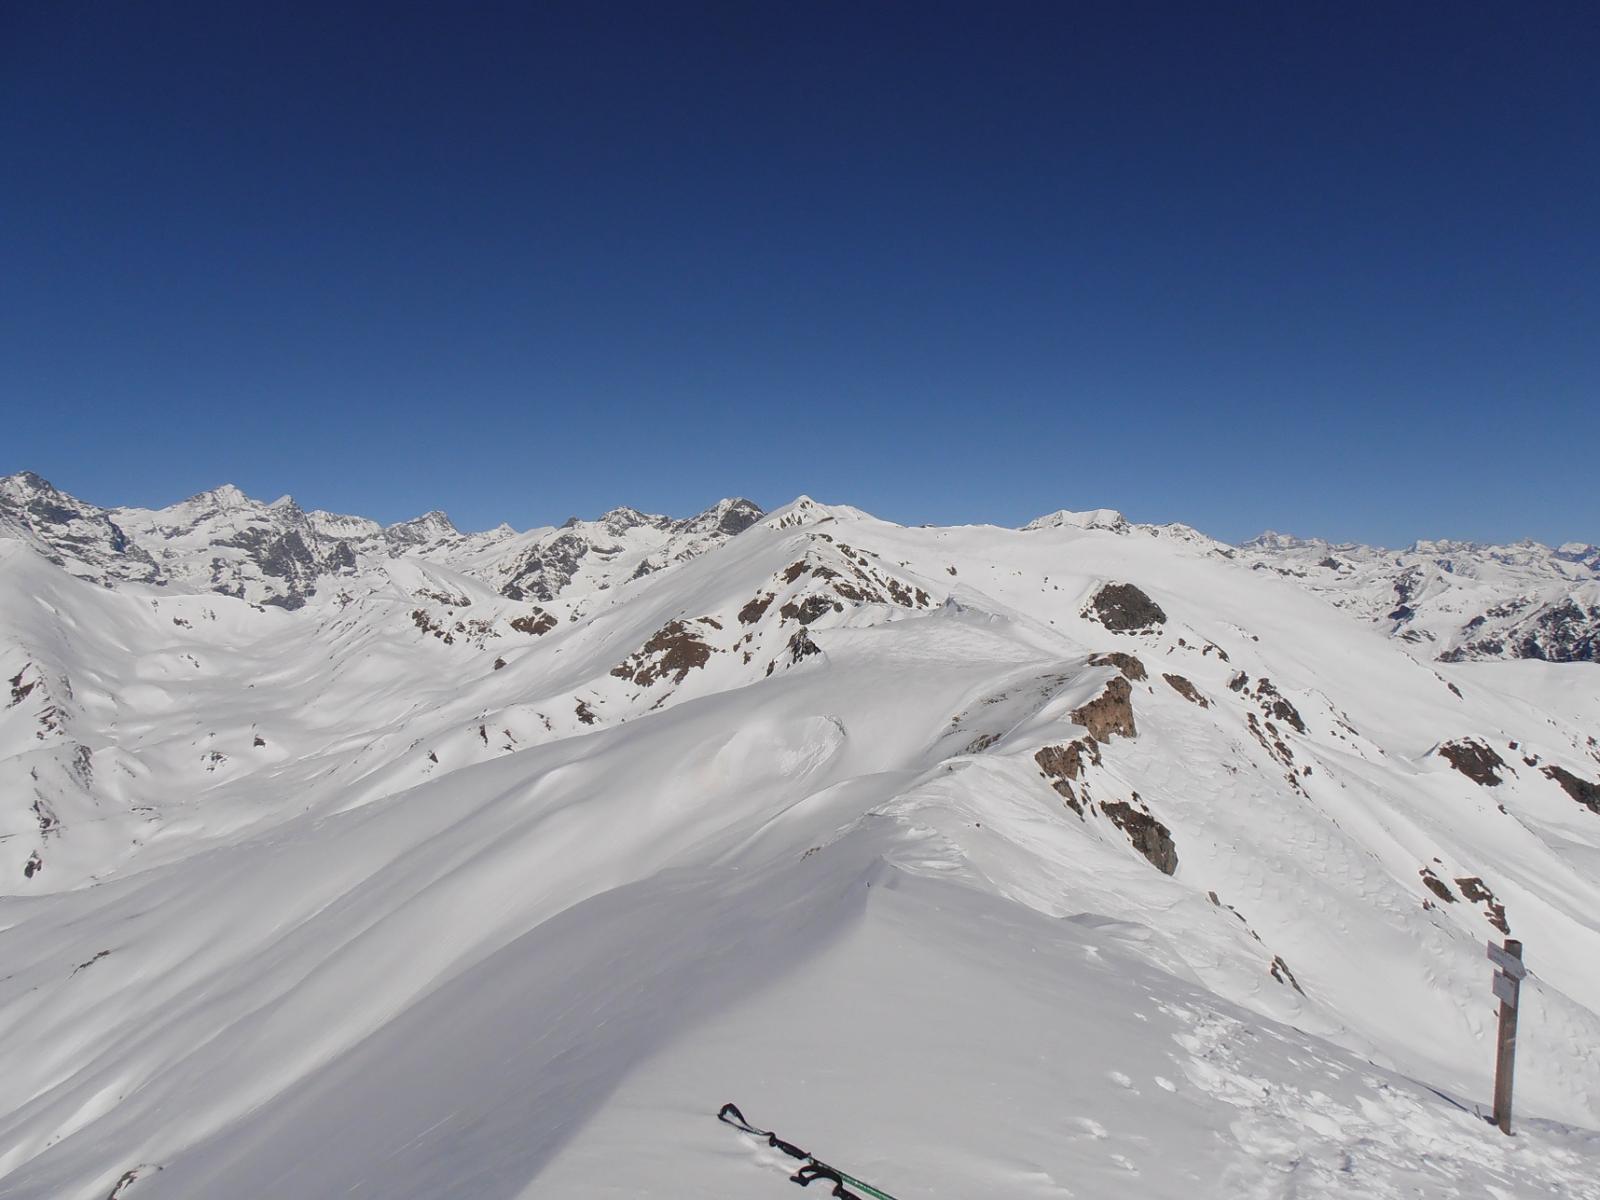 02 - Cresta verso la Punta Grifone